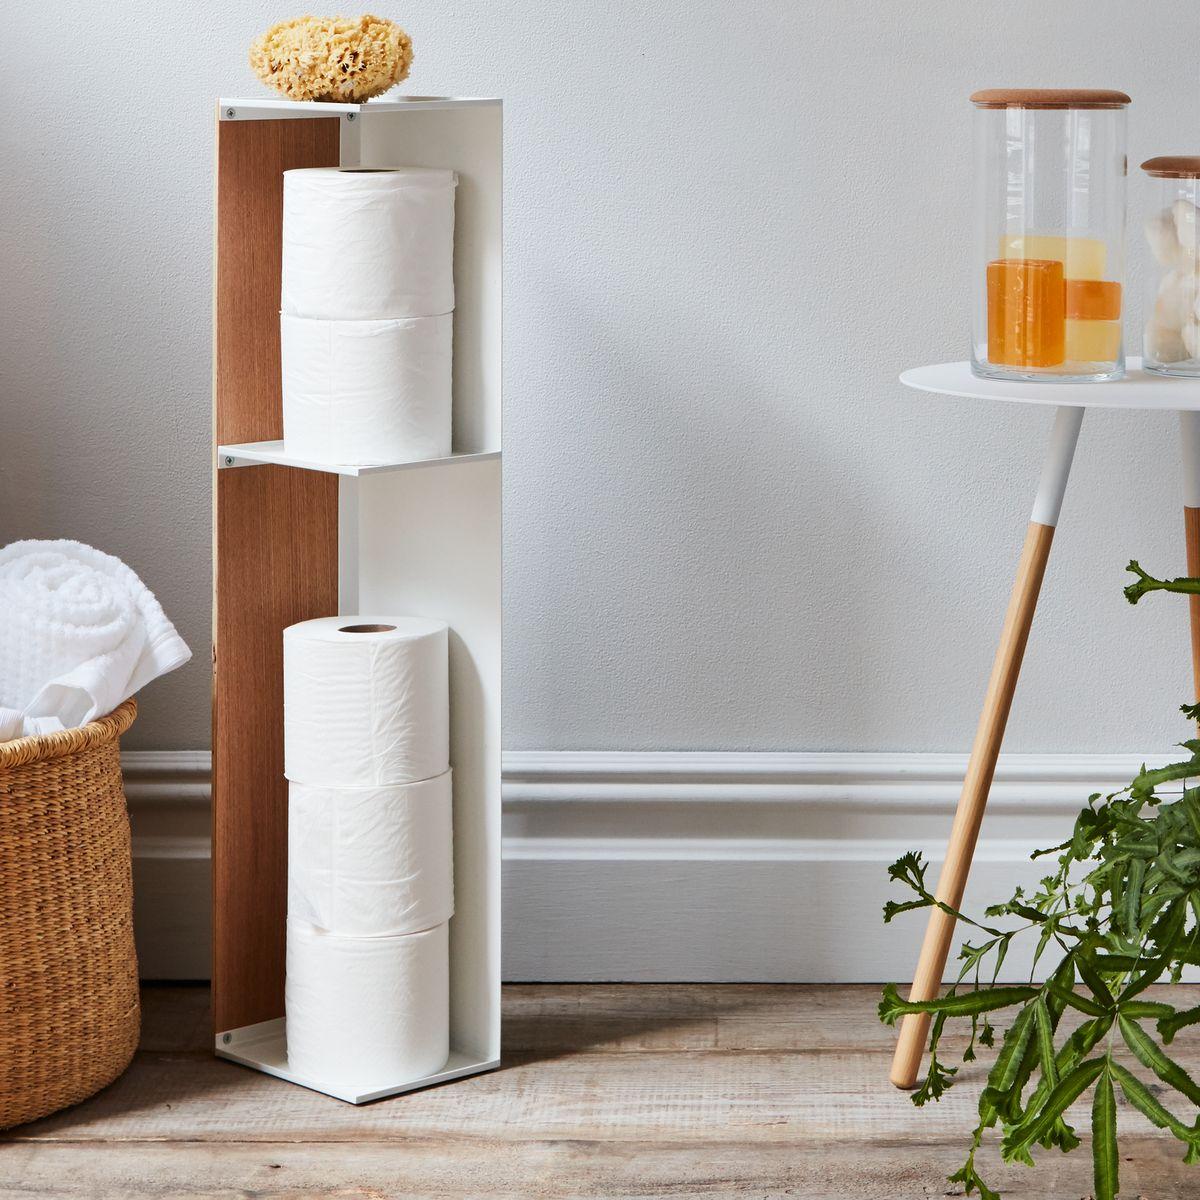 11 Best Bathroom Plants Houseplants For Low Light High Humidity